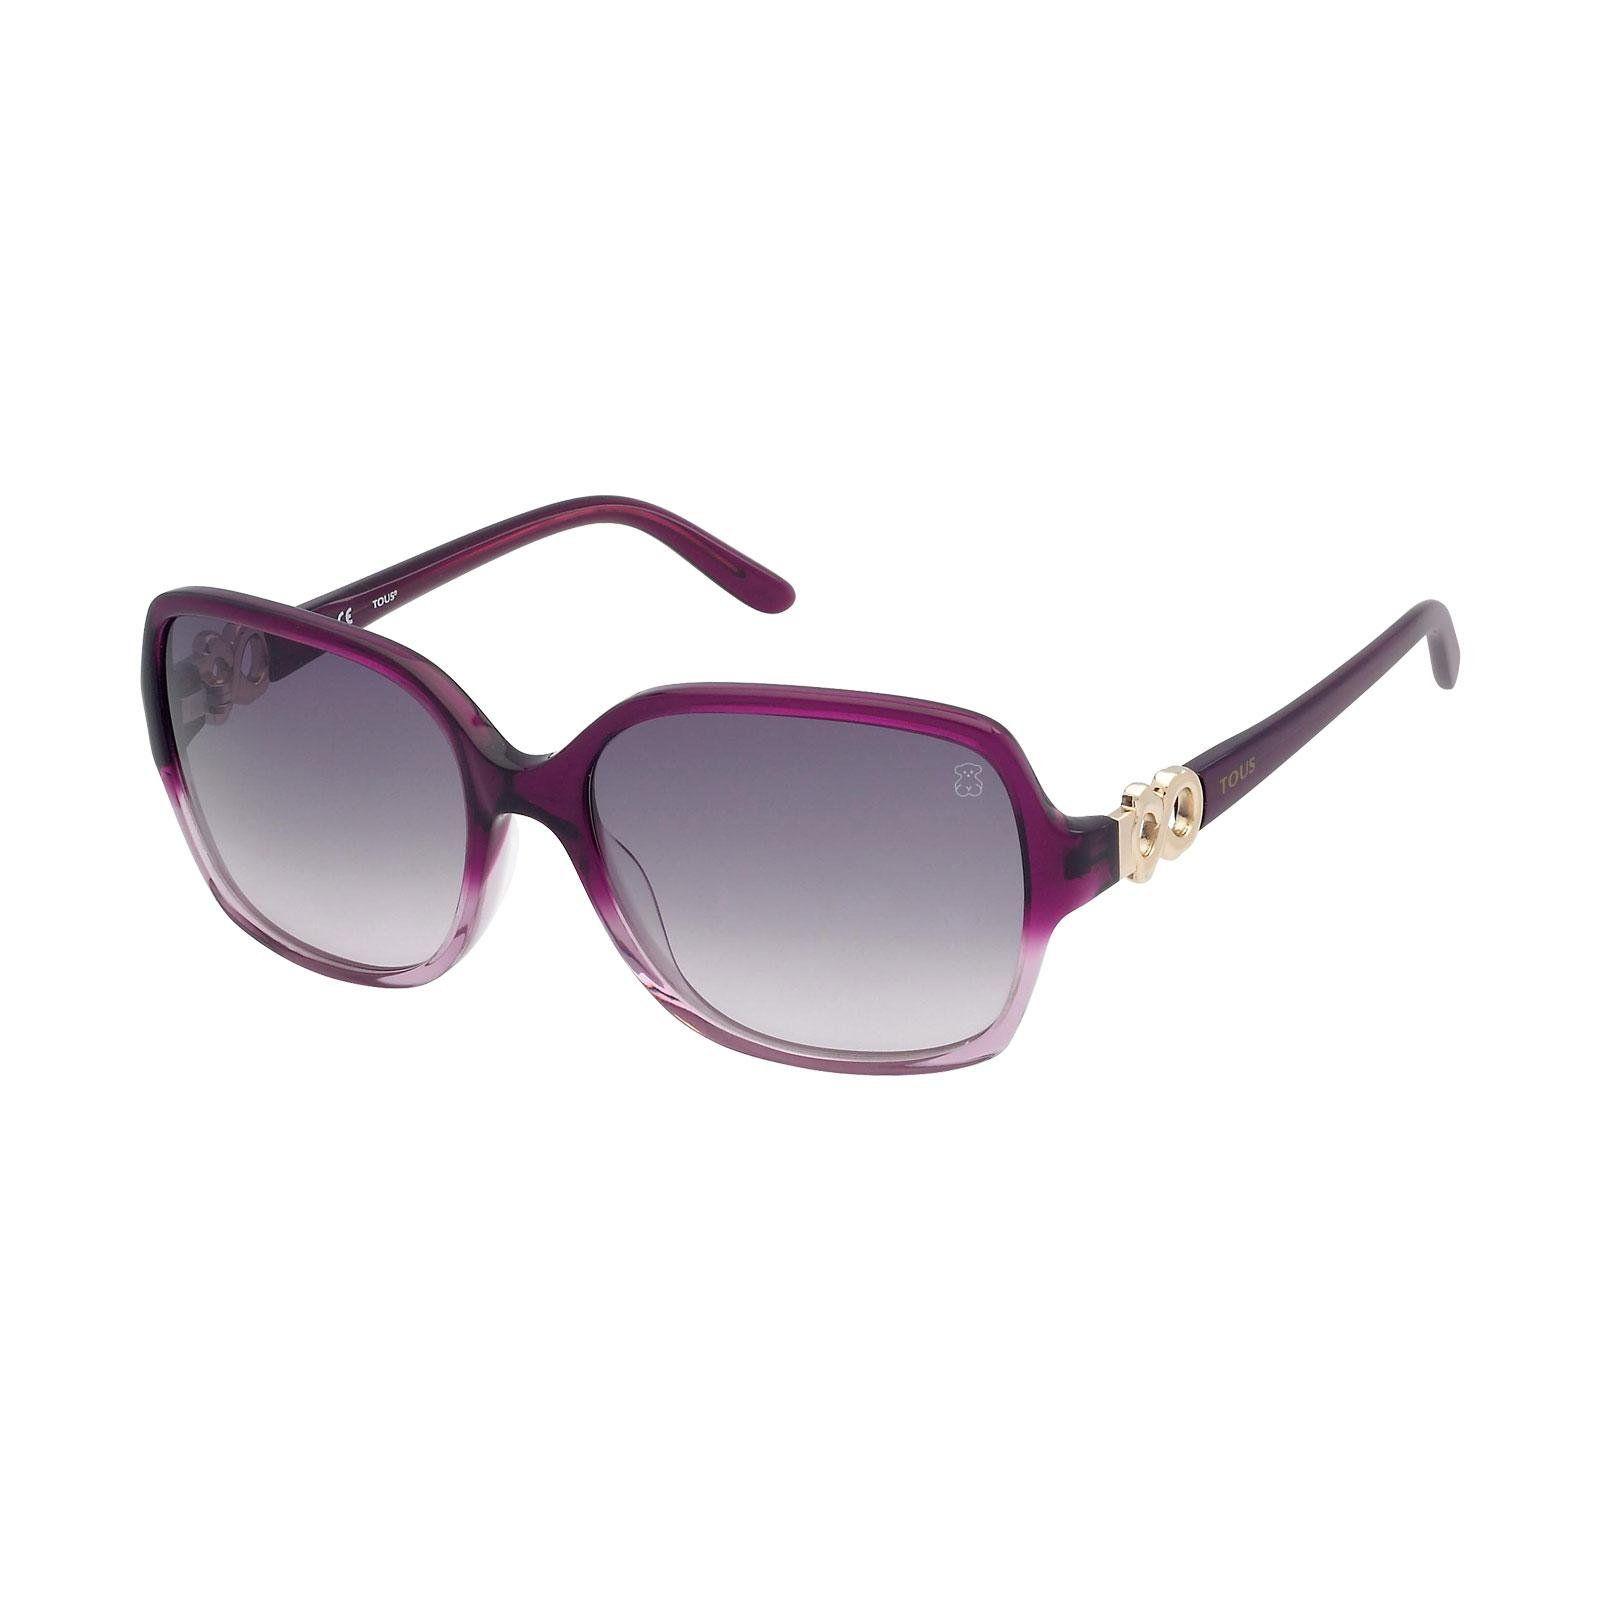 31b54dbc2d050 TOUS Infinit Trend sunglasses